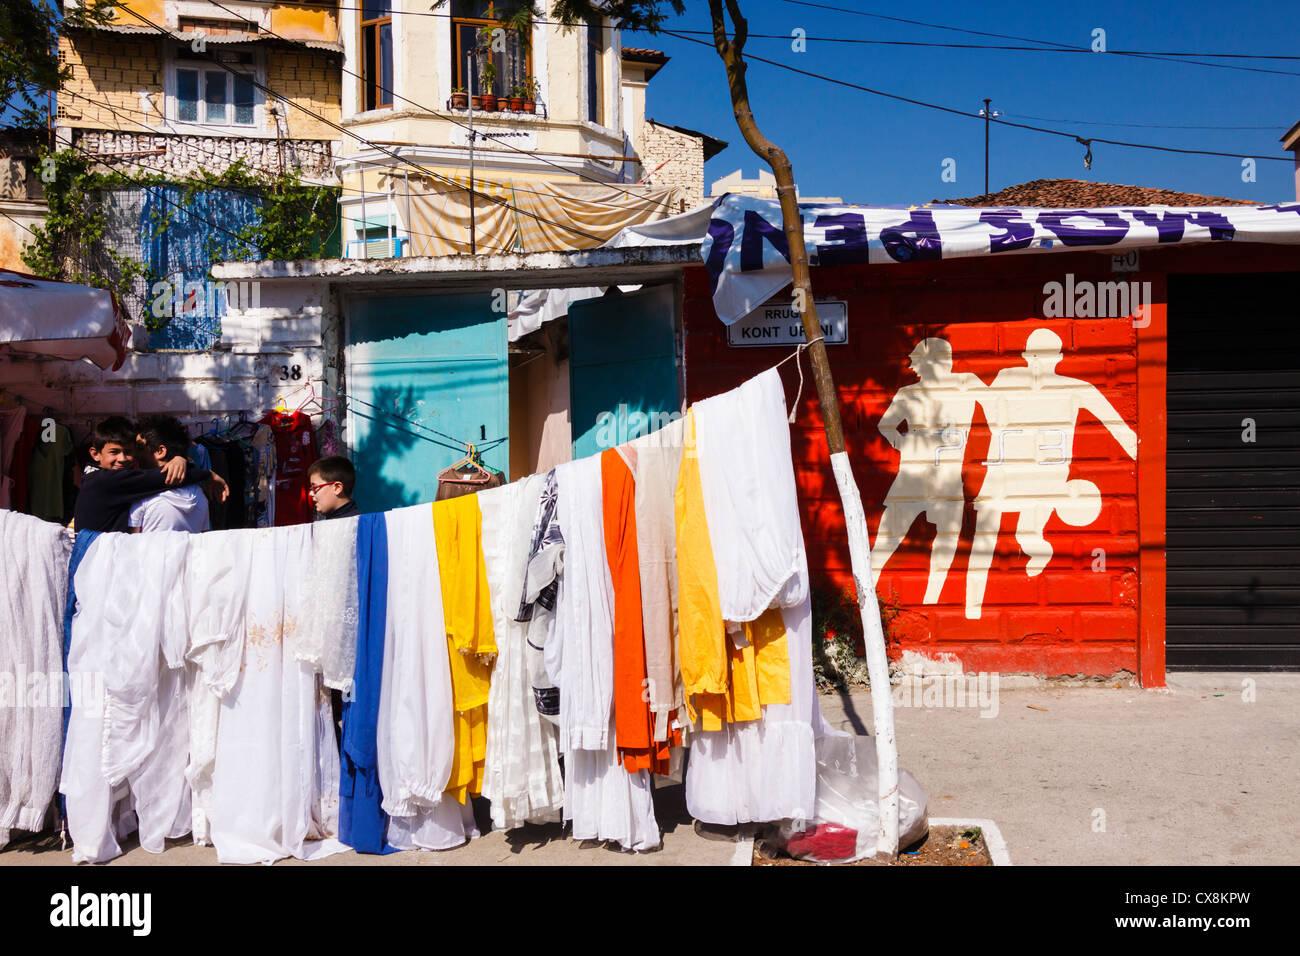 Albanian street scene with old villa, street market and football graffiti. Tirana, Albania - Stock Image